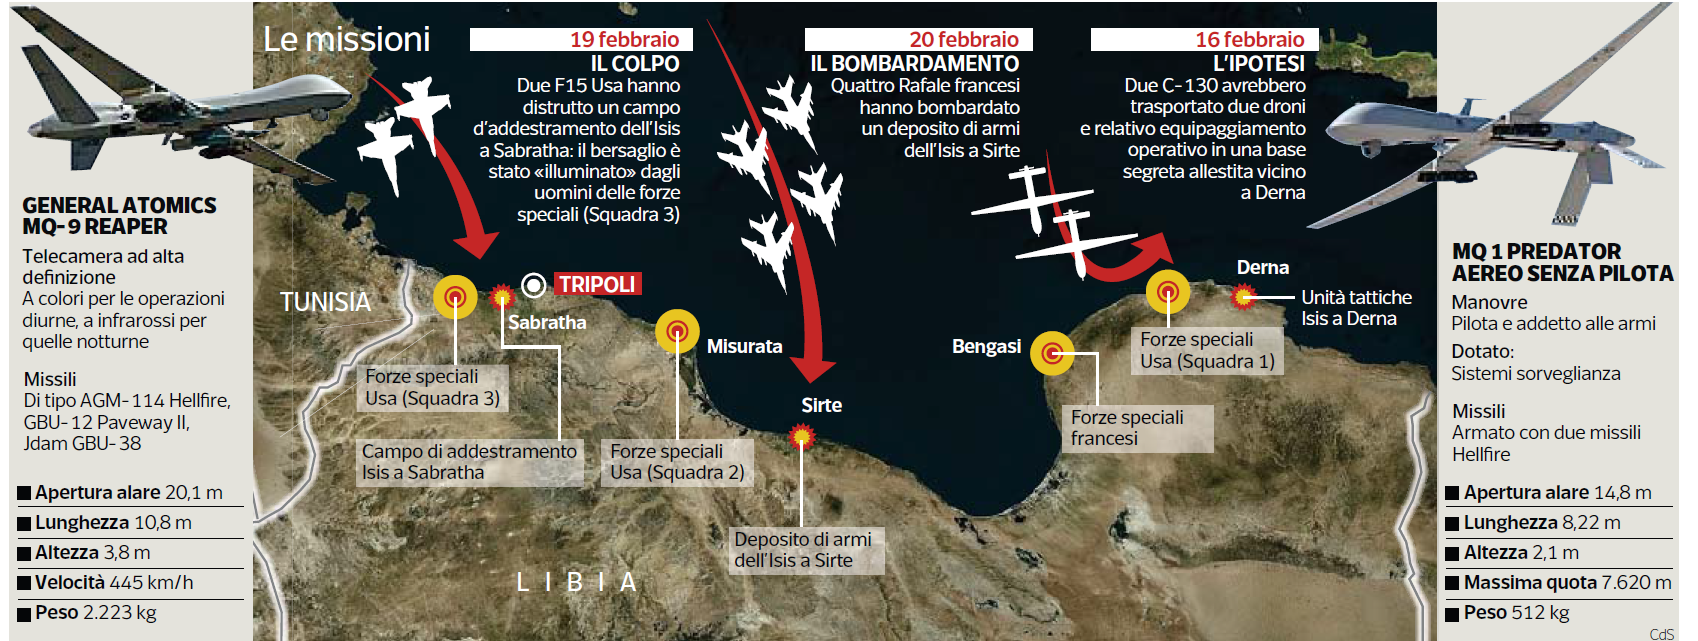 italia guerra libia accordo usa - 1